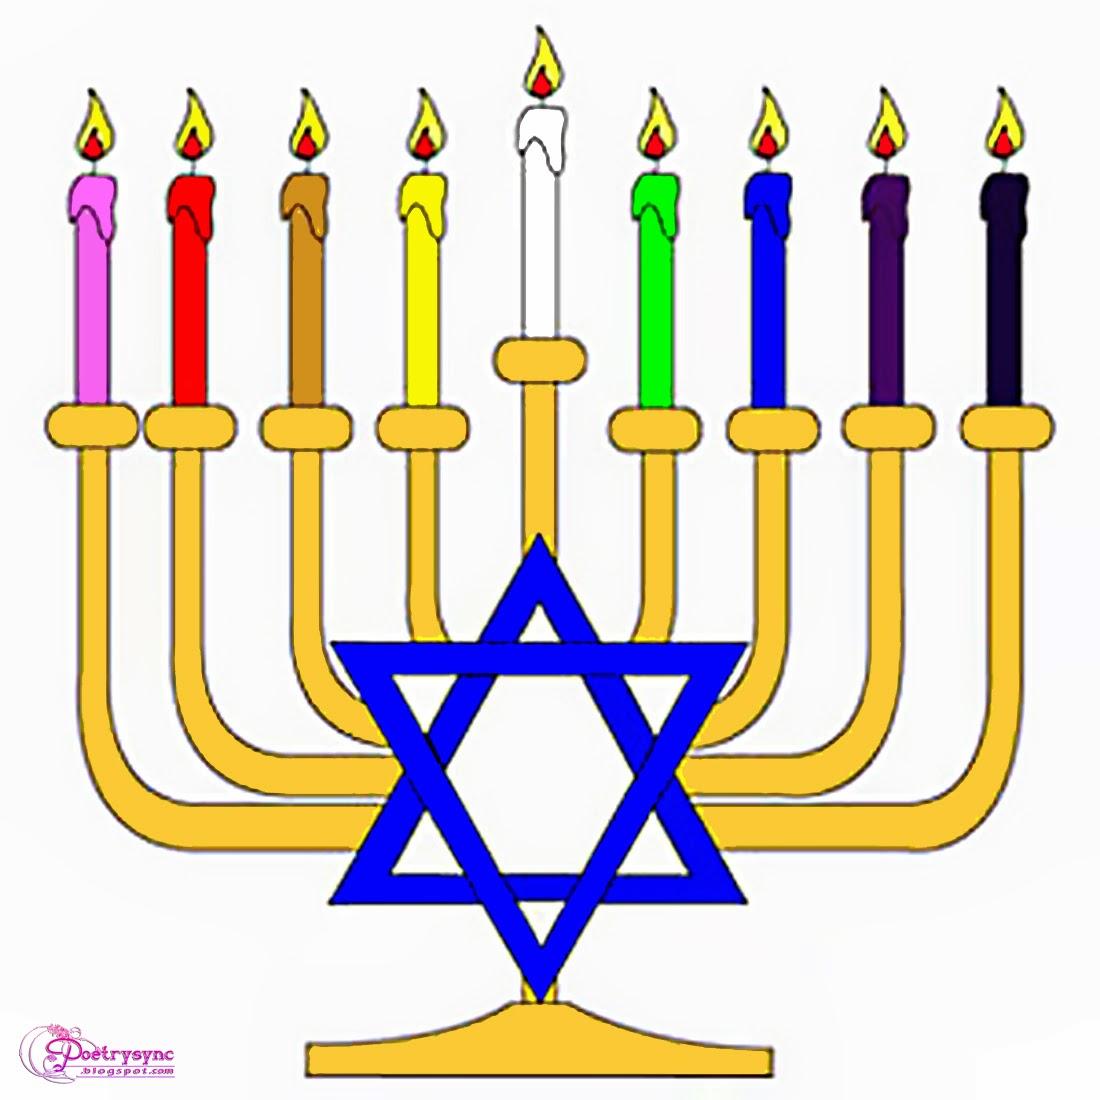 Happy New Year Hanukkah Candle Clip Art -Happy New Year Hanukkah Candle Clip Art Pictures-17